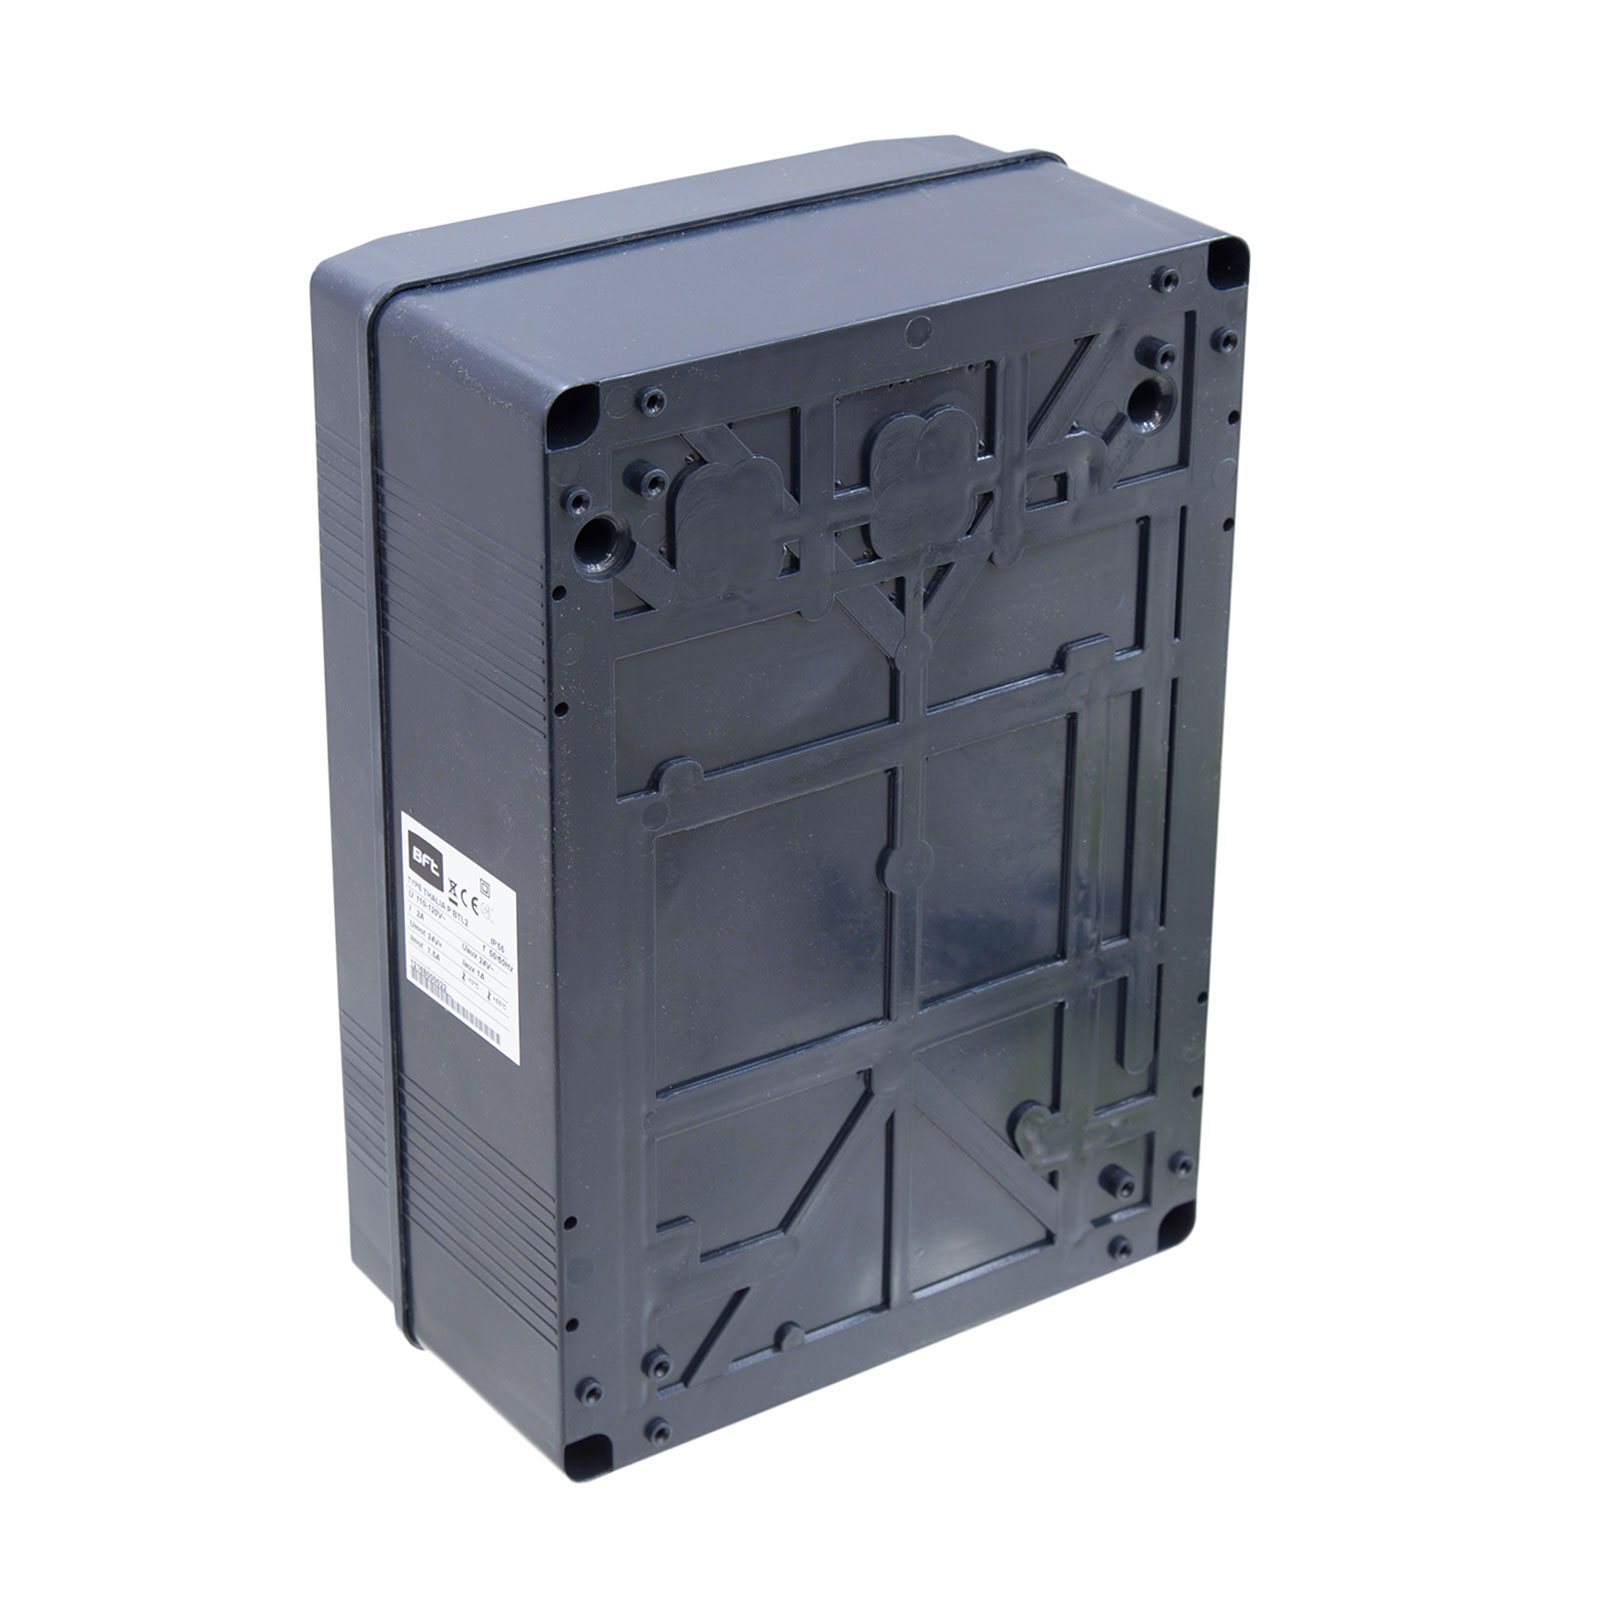 BFT THALIA Control Panel Installation manual PDF View/Download